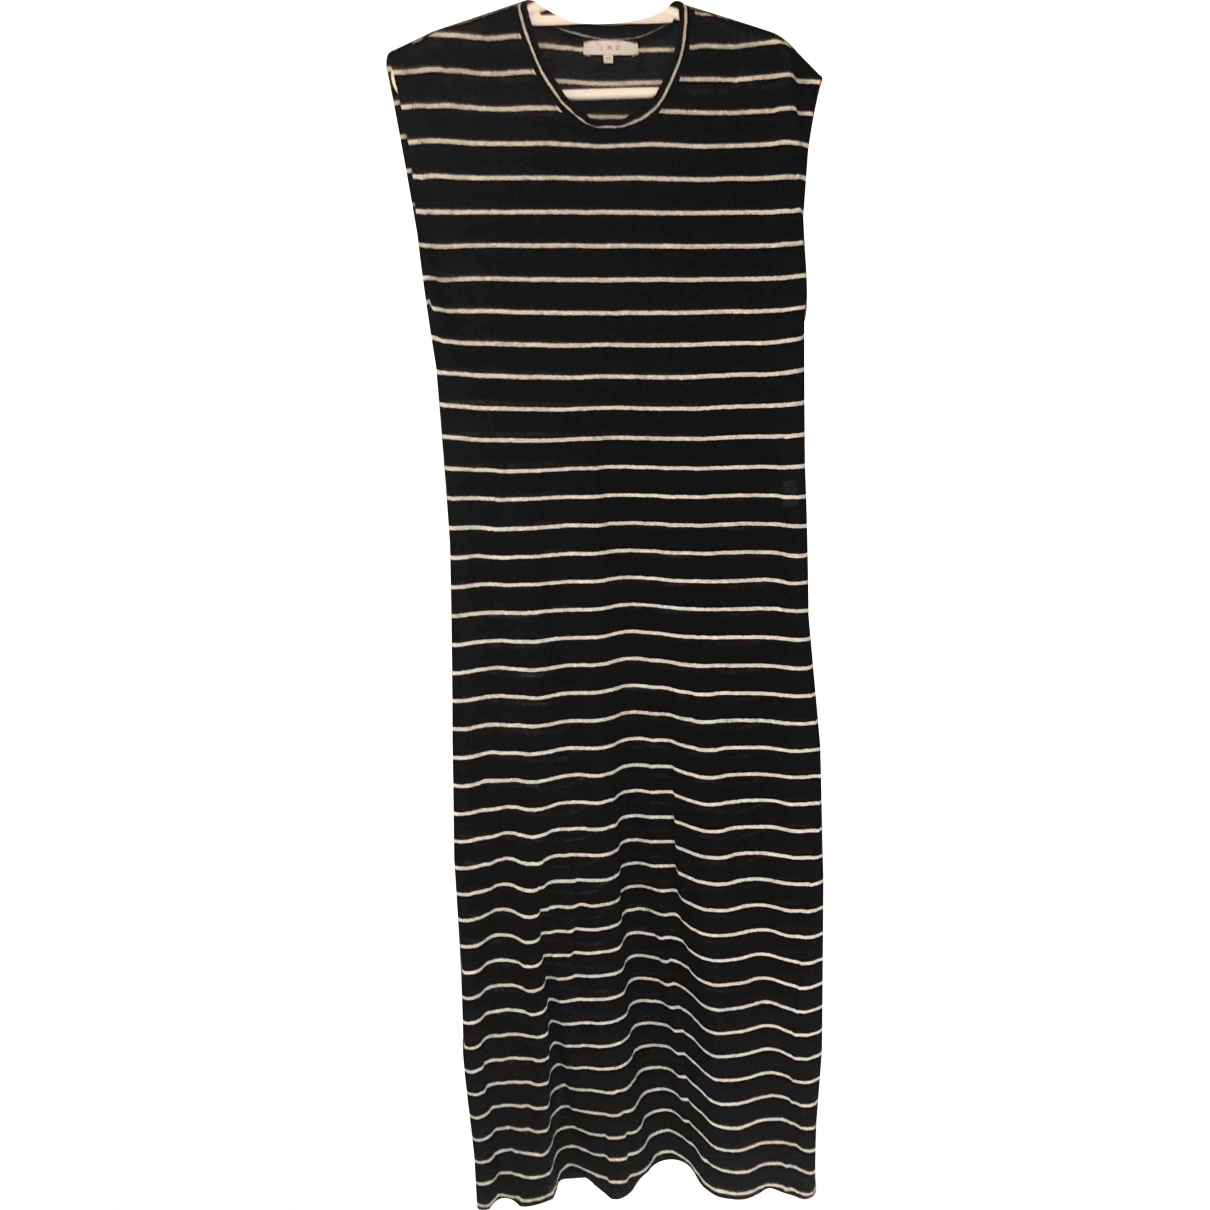 Iro \N Black Linen dress for Women XS International